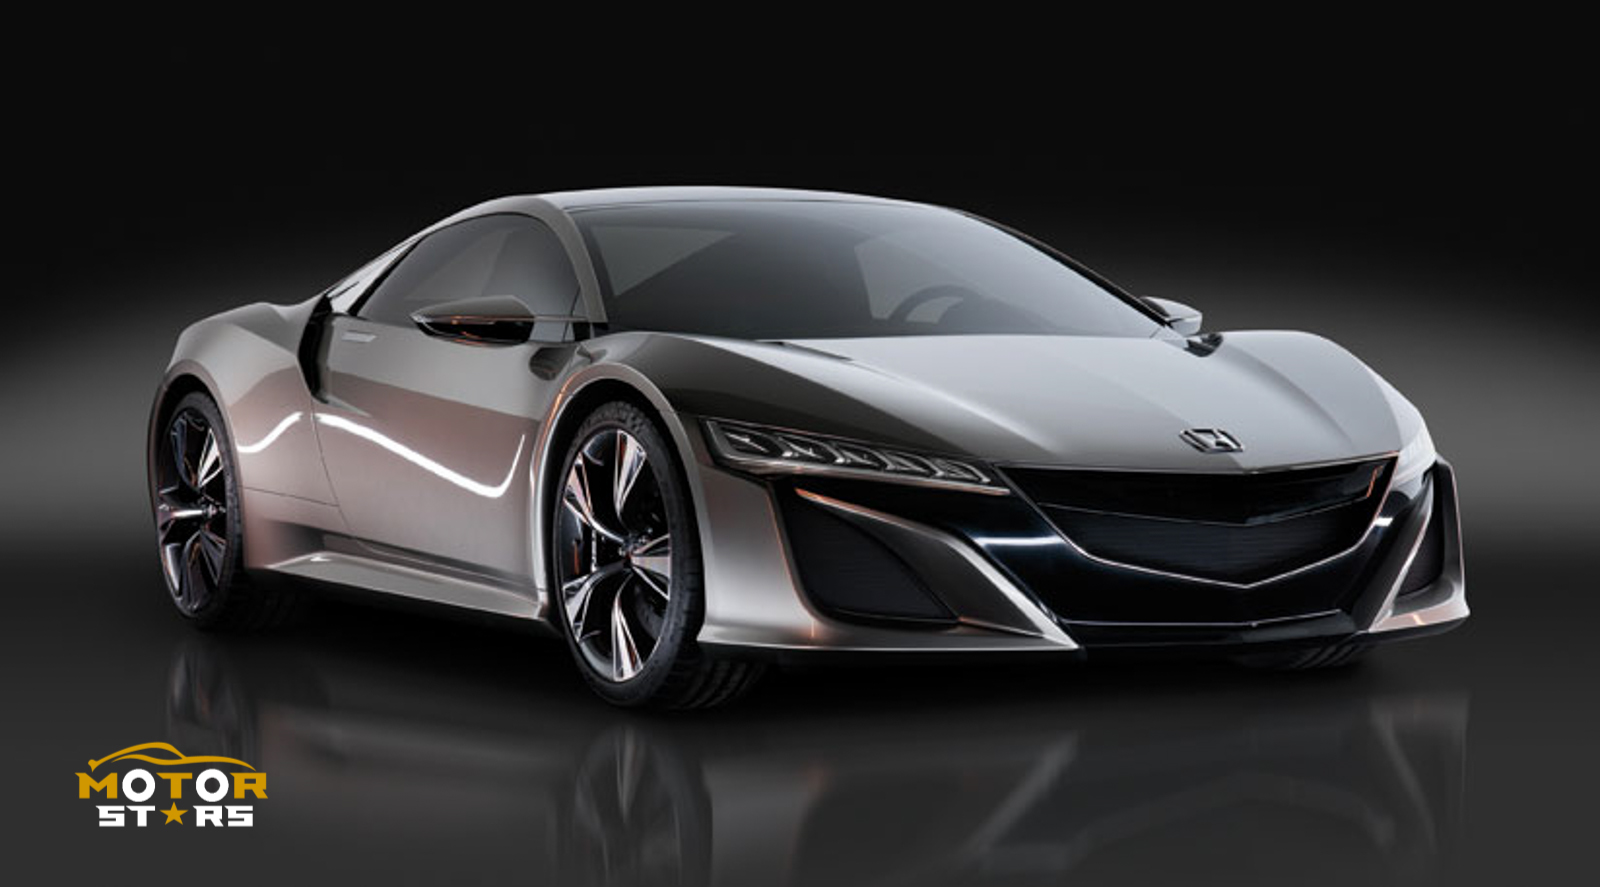 Honda Acura NSX 2015 Hybrid Electric Supercar-18 2013 concept grey front – MotorStars